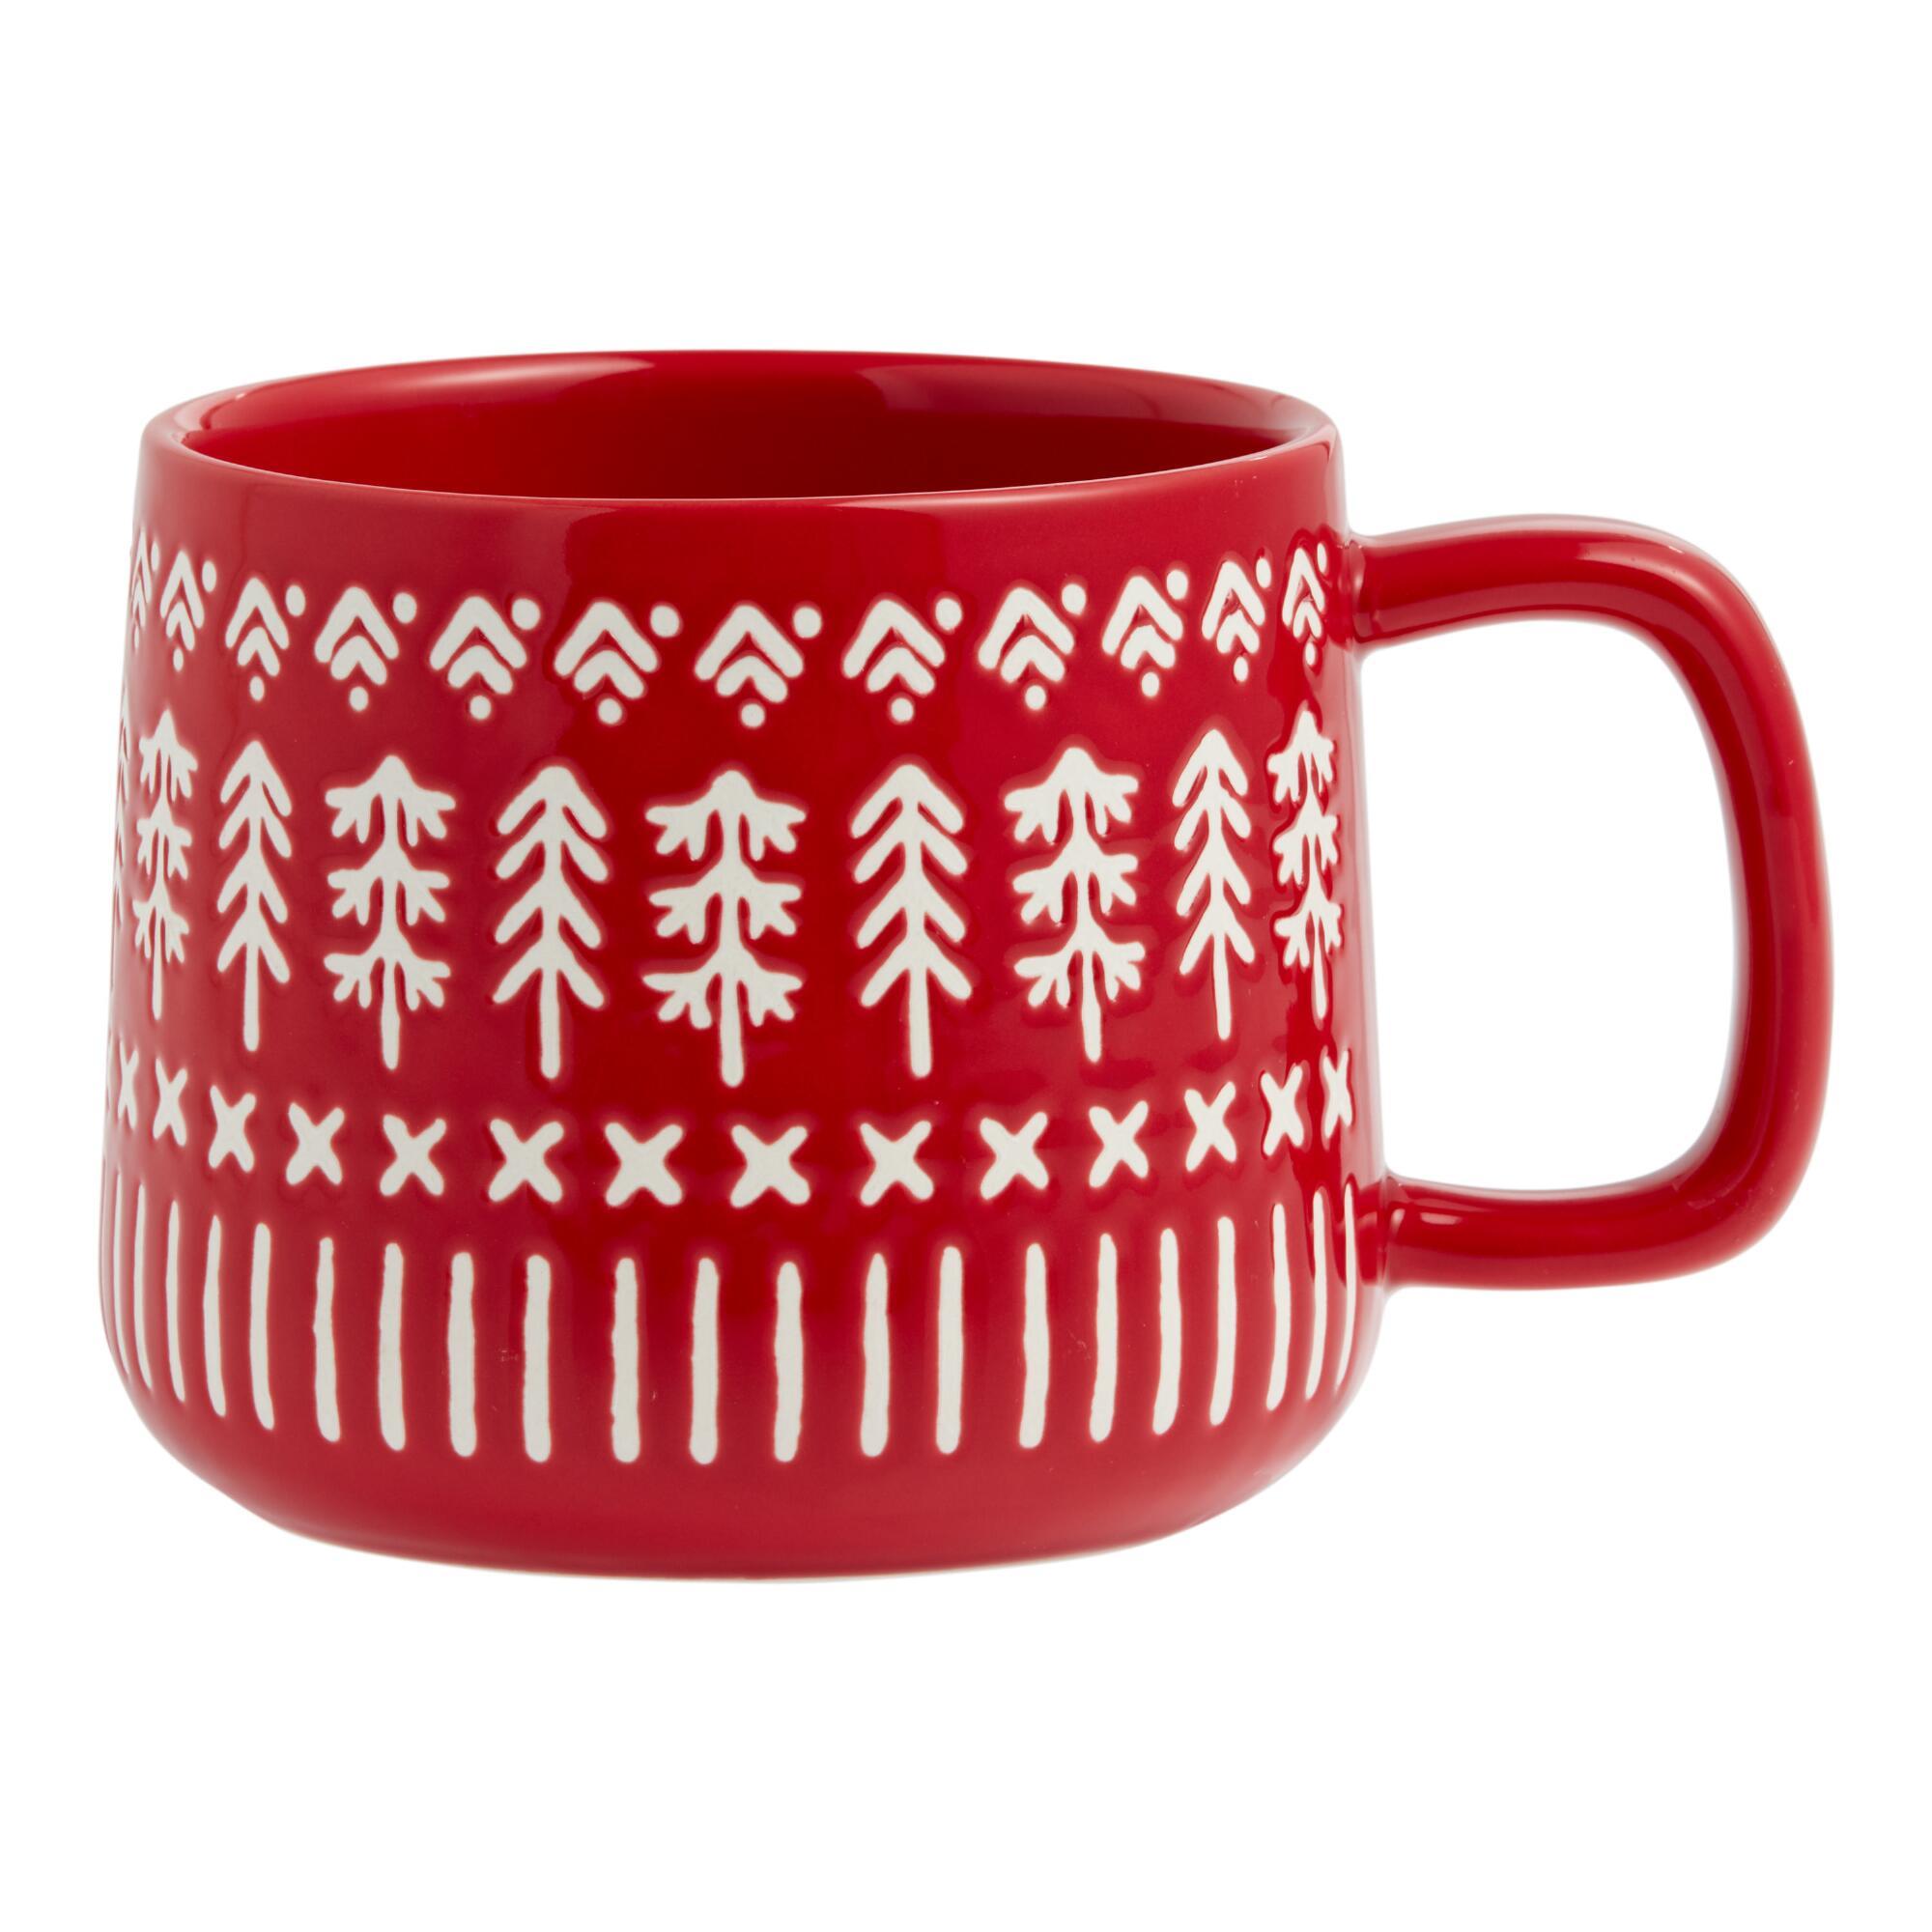 Holiday Wax Resist Mud Cloth Mug $7.99